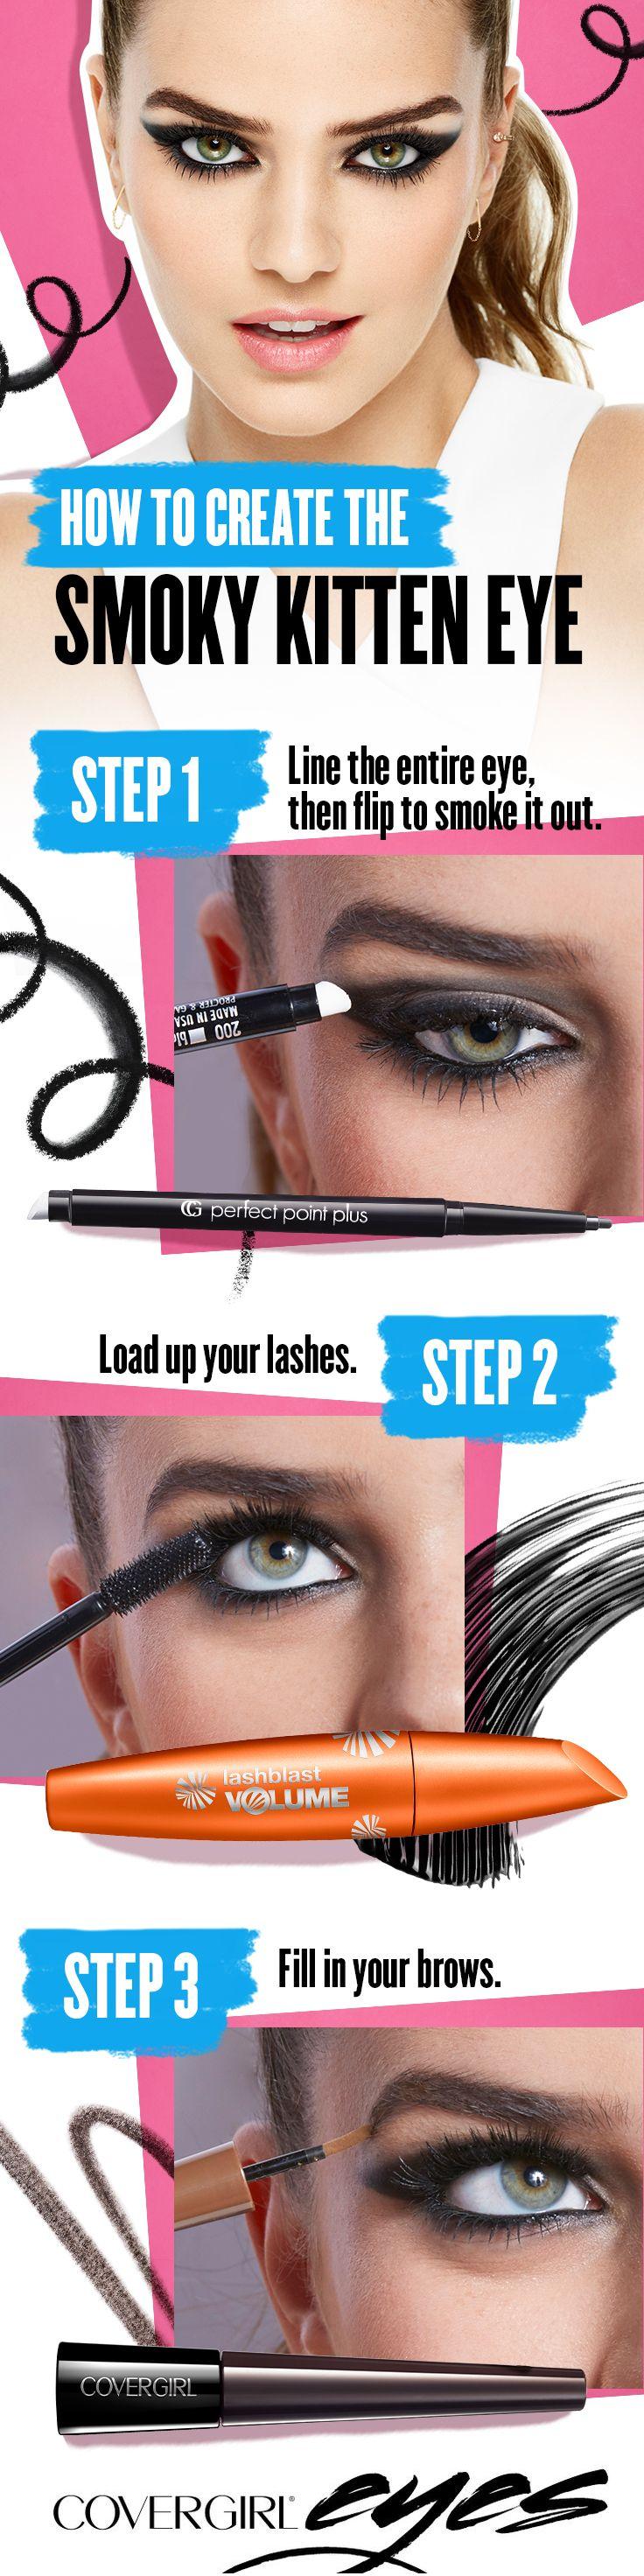 best bigger makeup images on pinterest beauty makeup diy